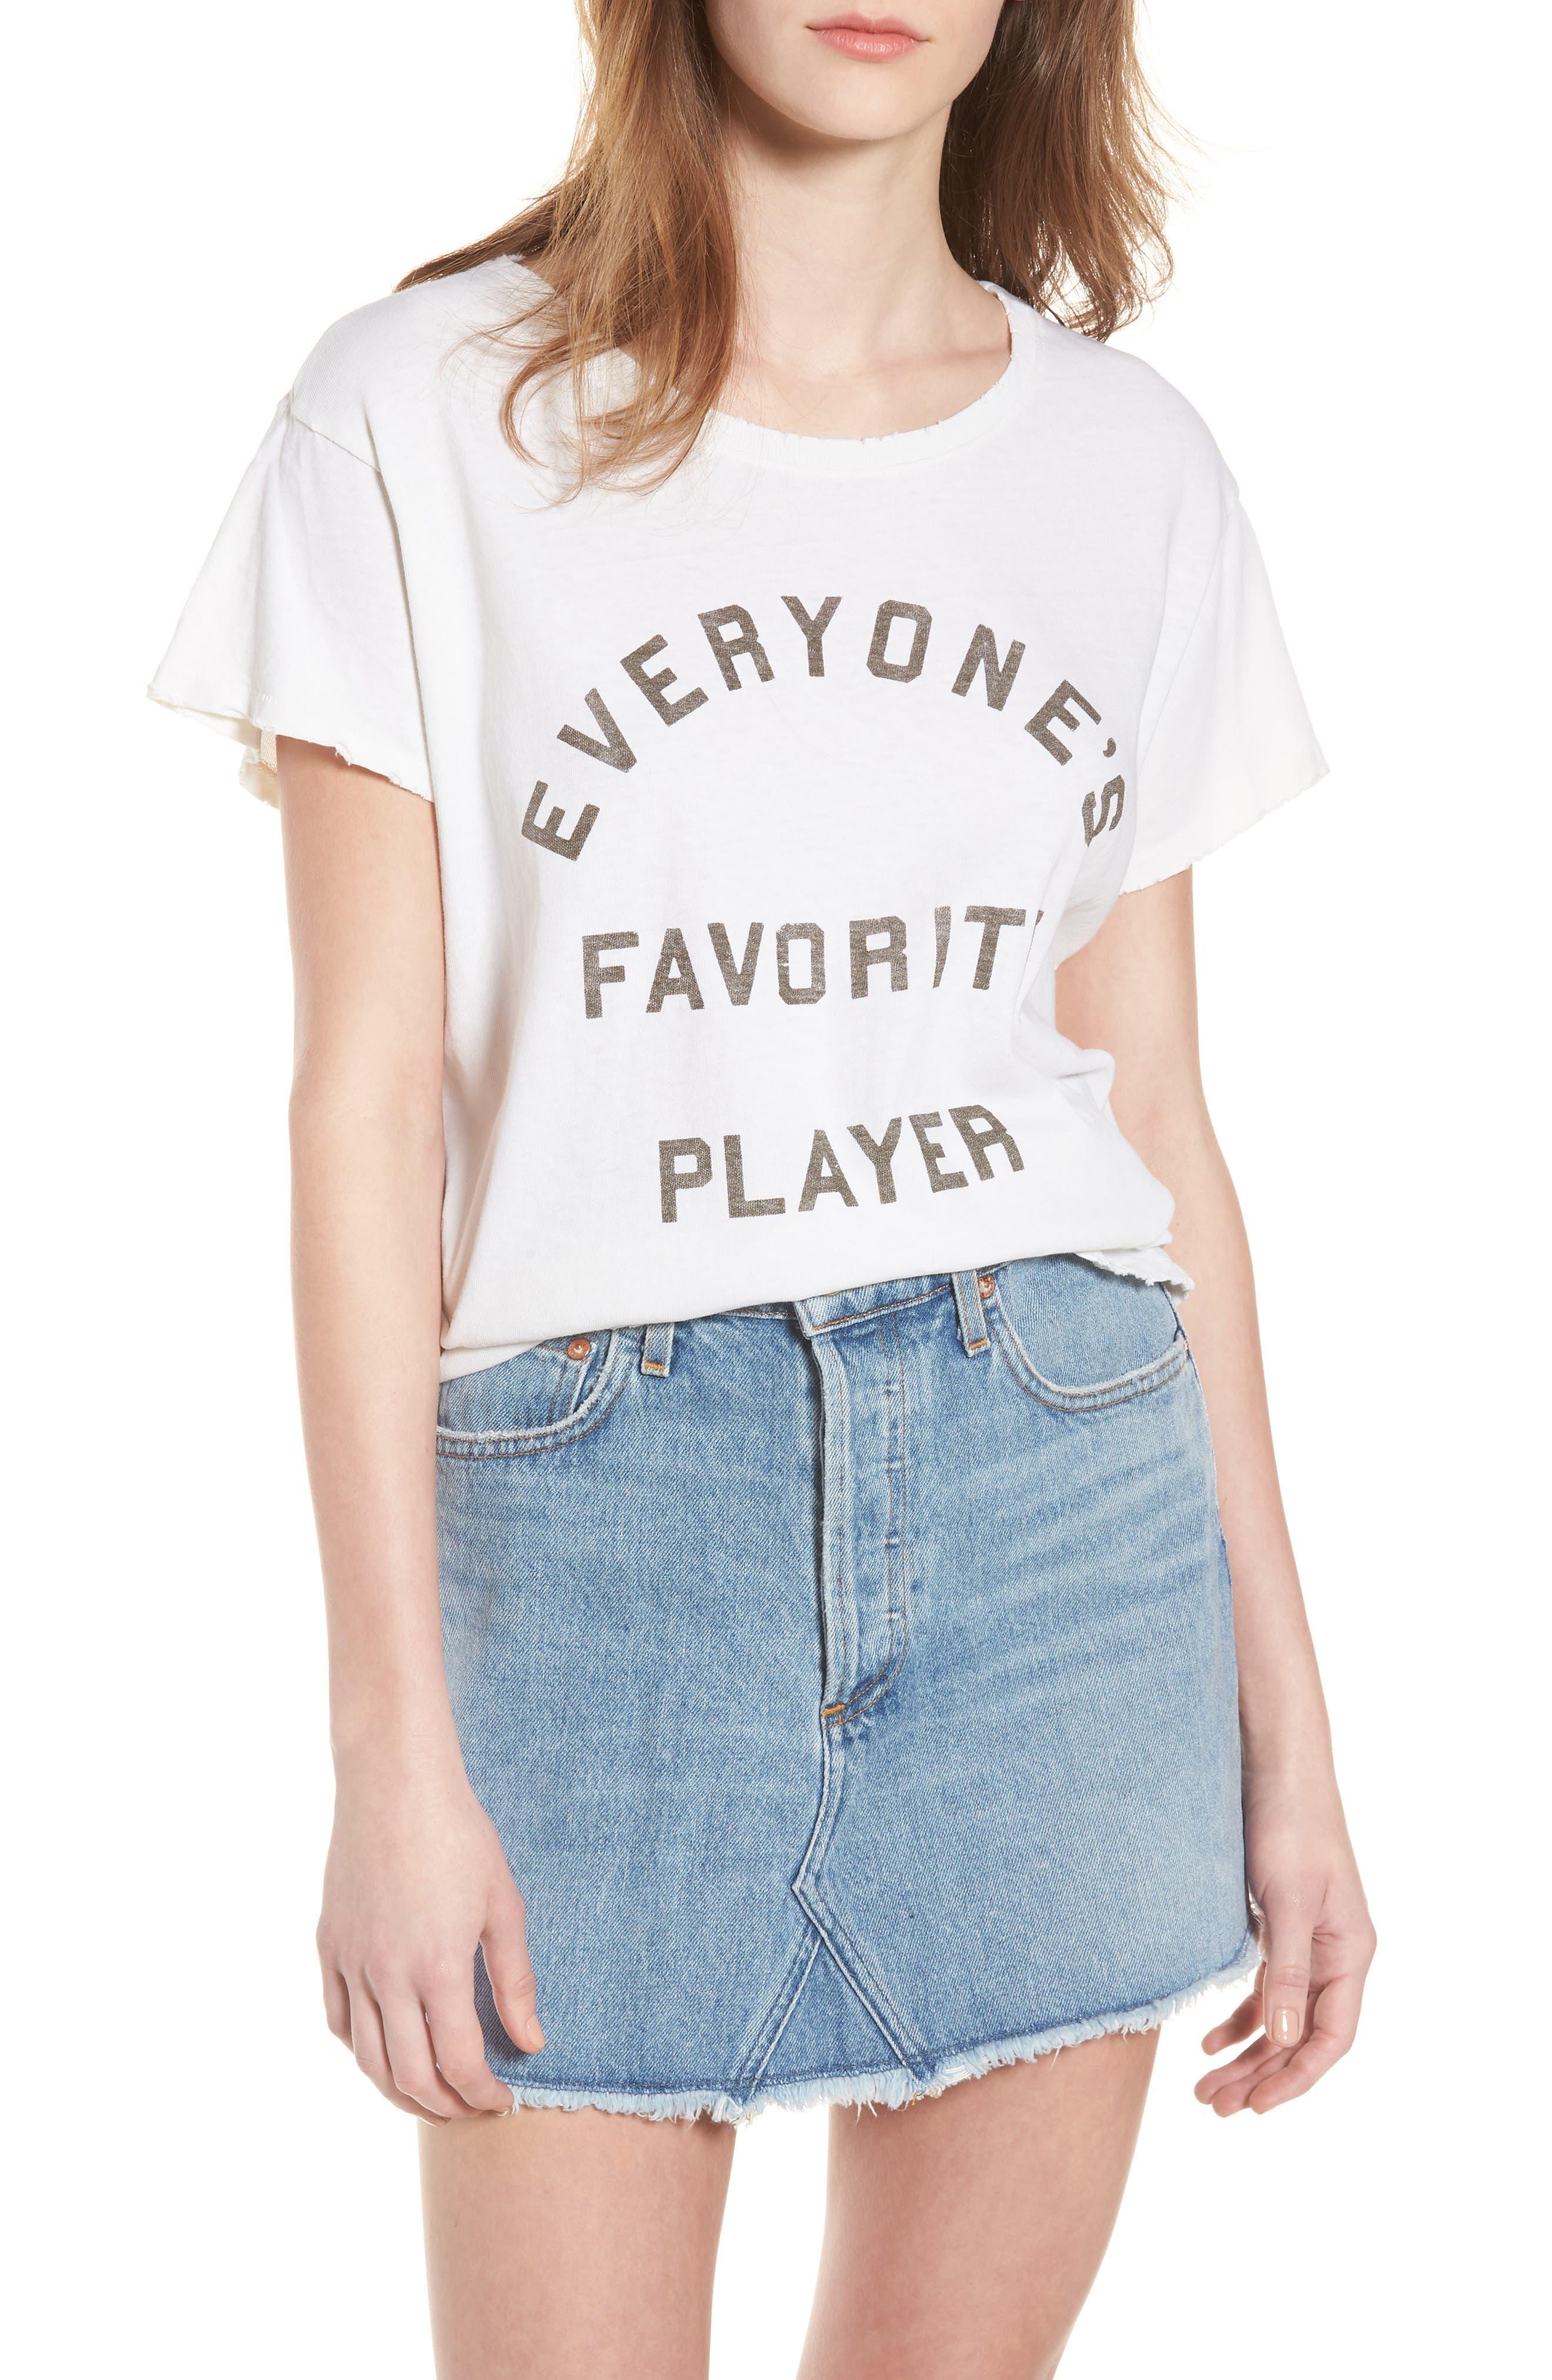 EVERYONE'S FAVORITE PLAYER TEE